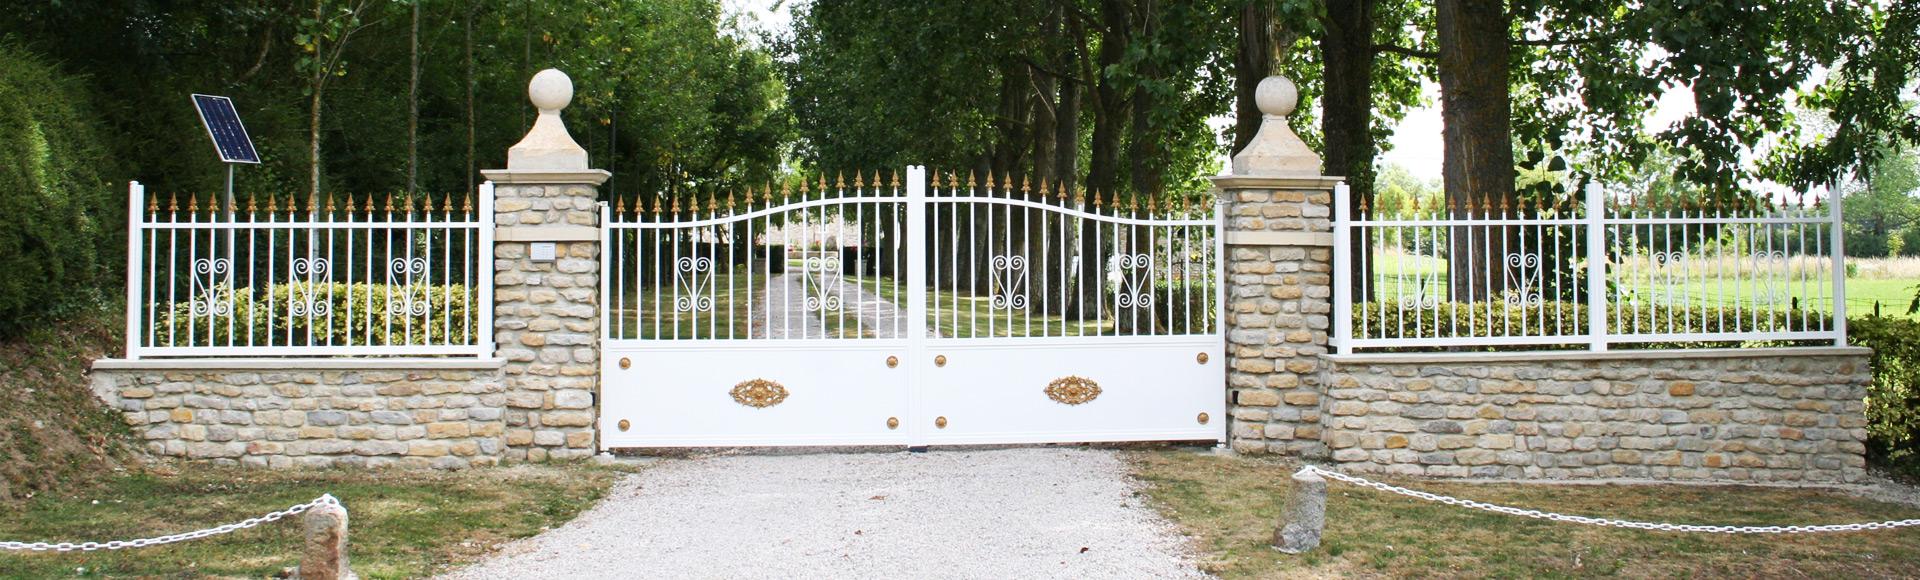 Portail-aluminium-Vierville-Manche